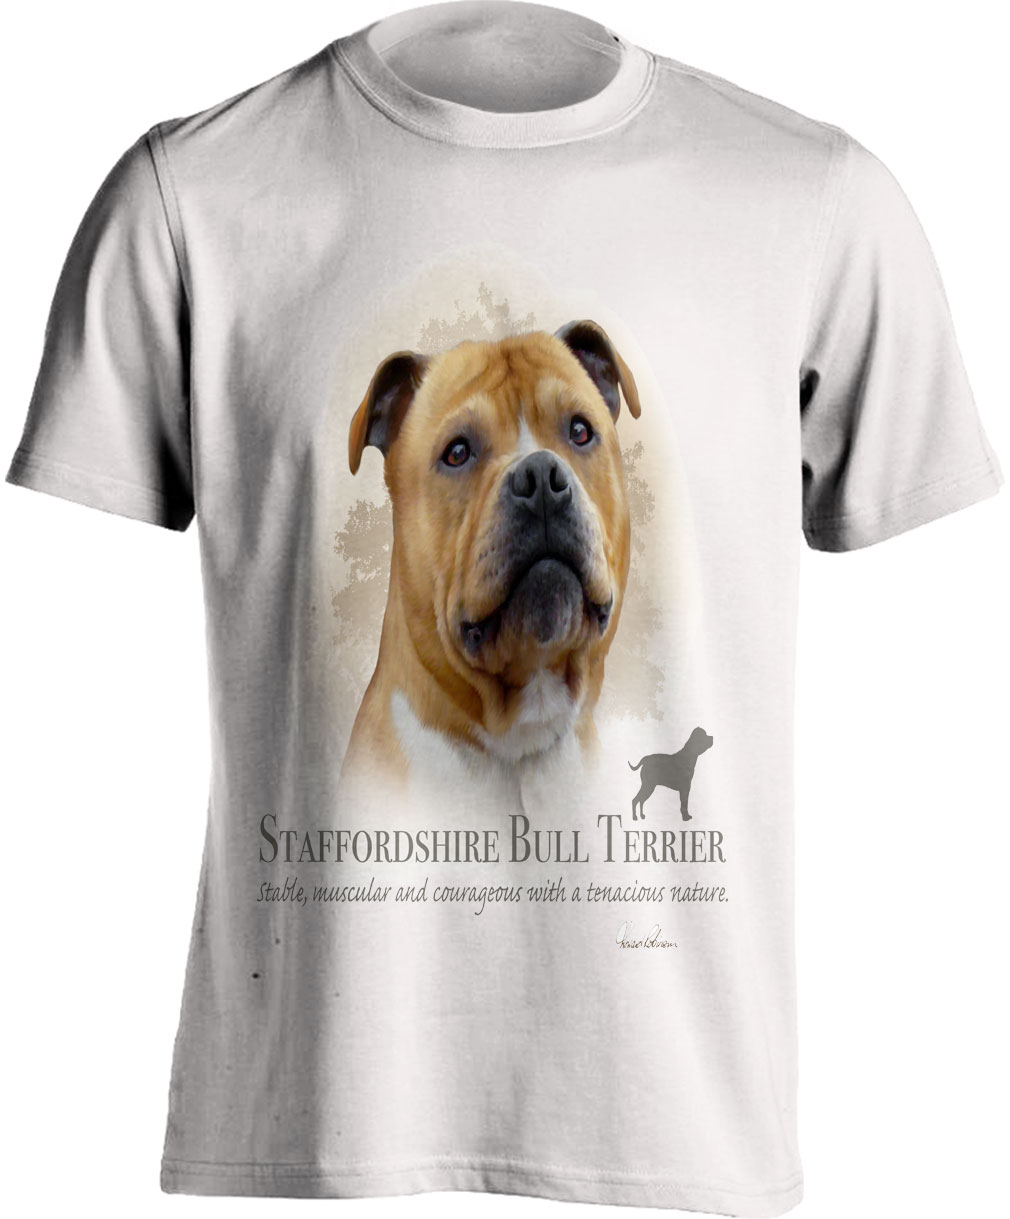 Staffordshire Bull Terrier T Shirt